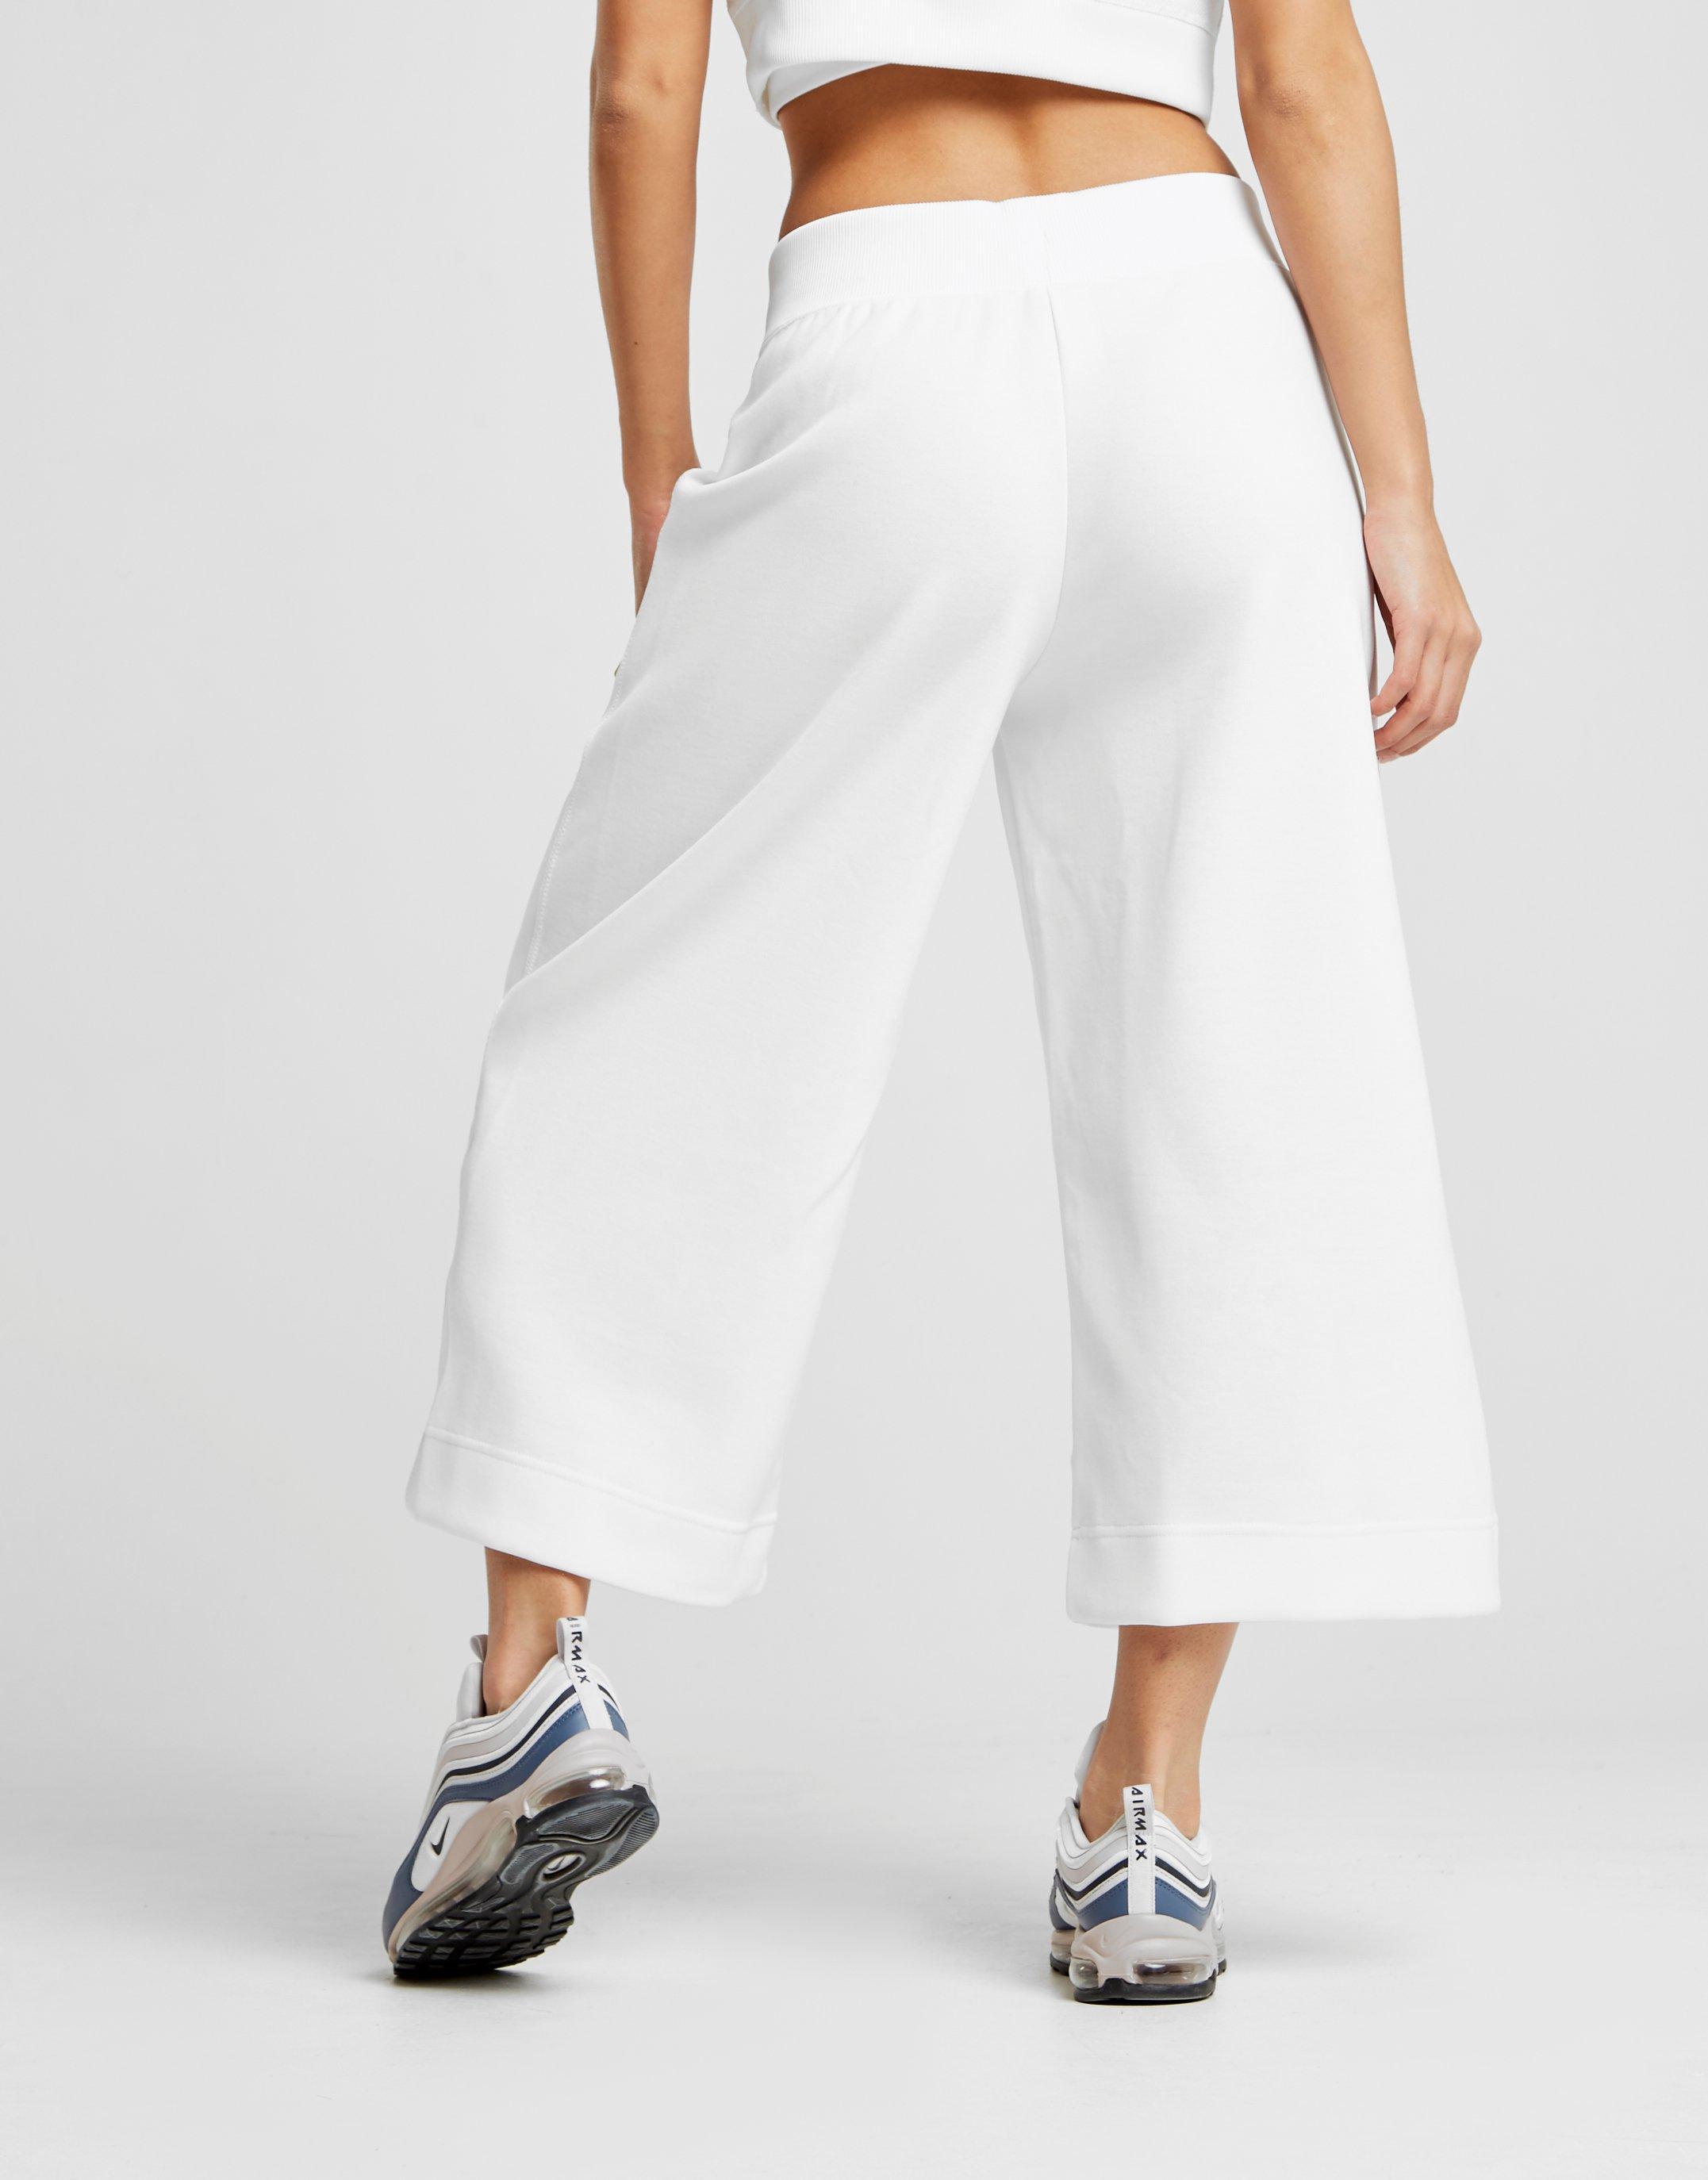 32ae07b0194ed Nike Beautiful X Powerful Culottes in White - Lyst